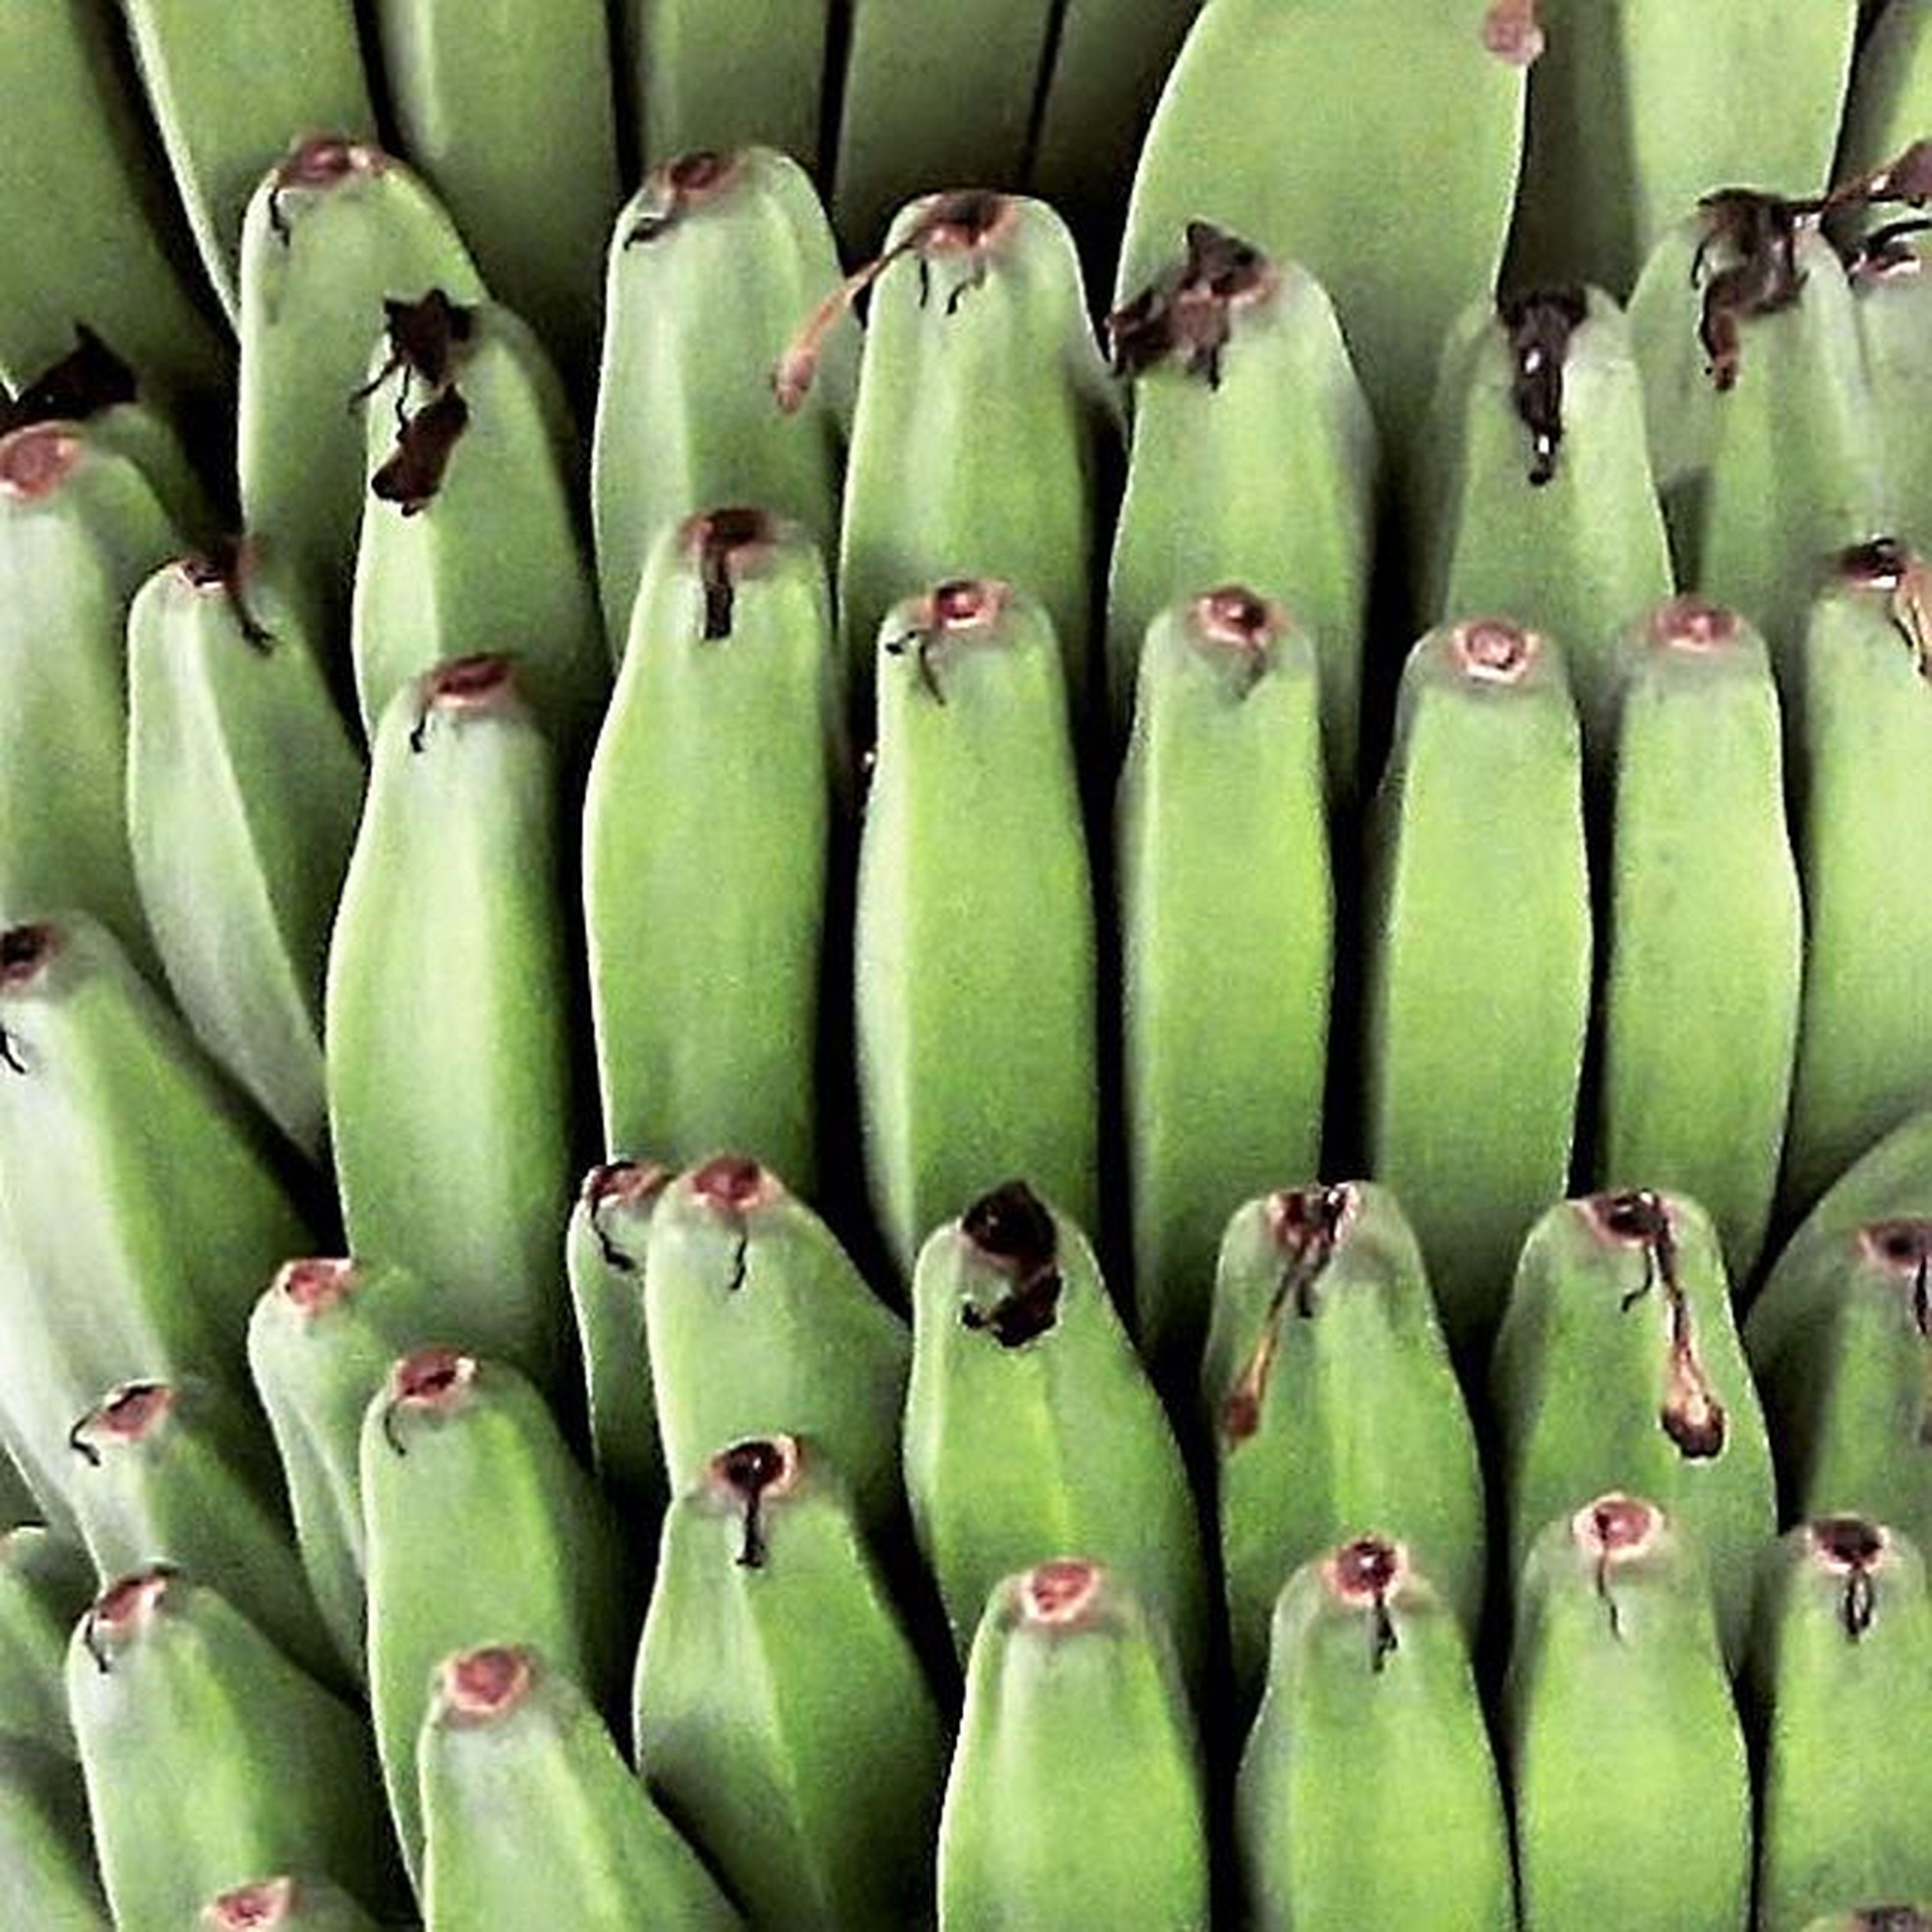 Nature of regularity. Nature Naturephotography Fruits Banana Pisang Pisangbali Kepokbali Green Nice Cool Regular Photooftheday